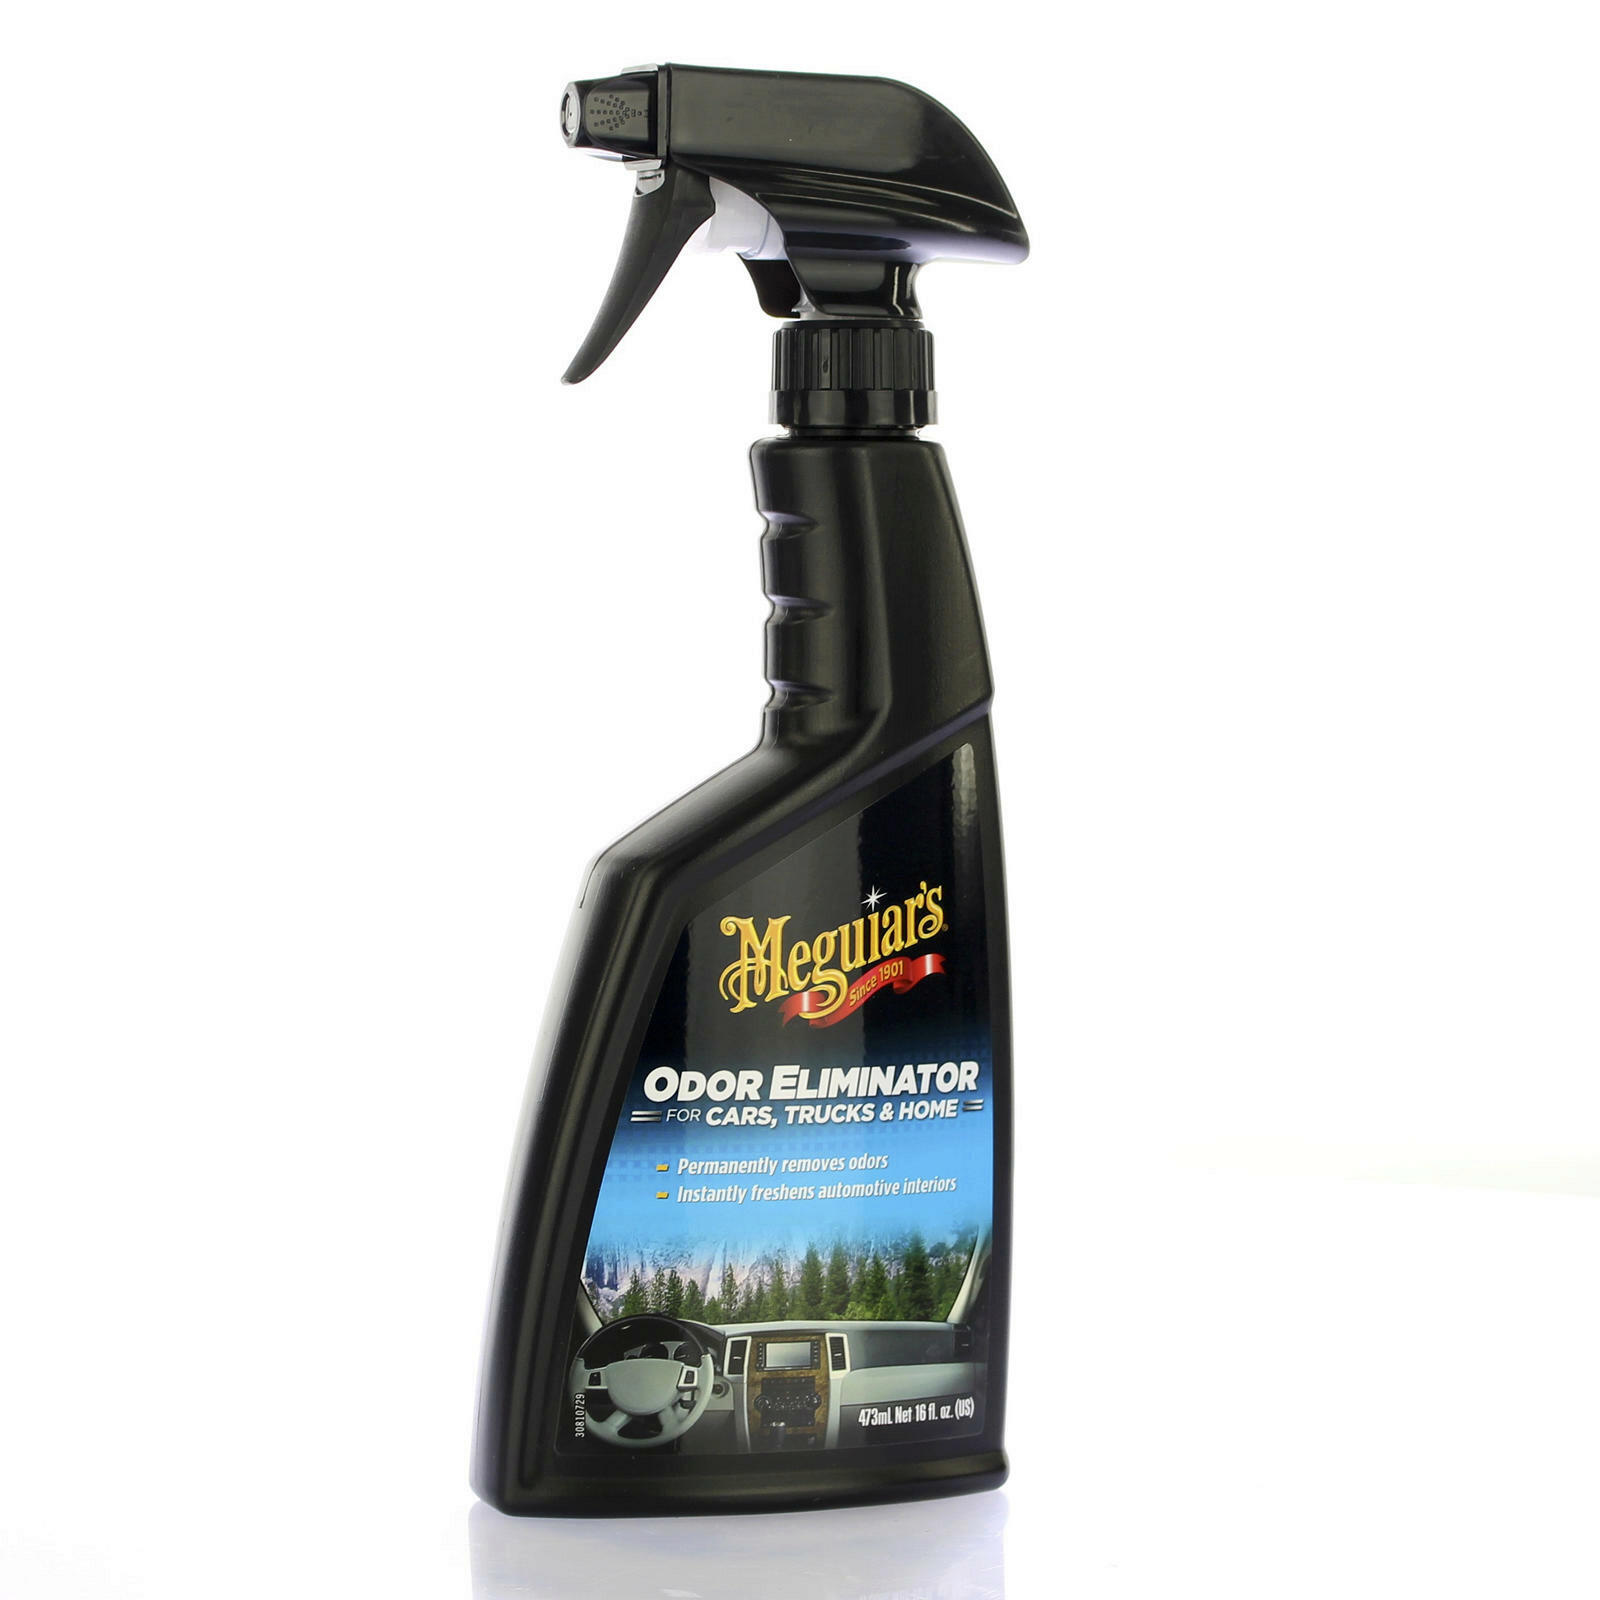 Meguiars Car Odor Eliminator 473ml Lufterfrischer